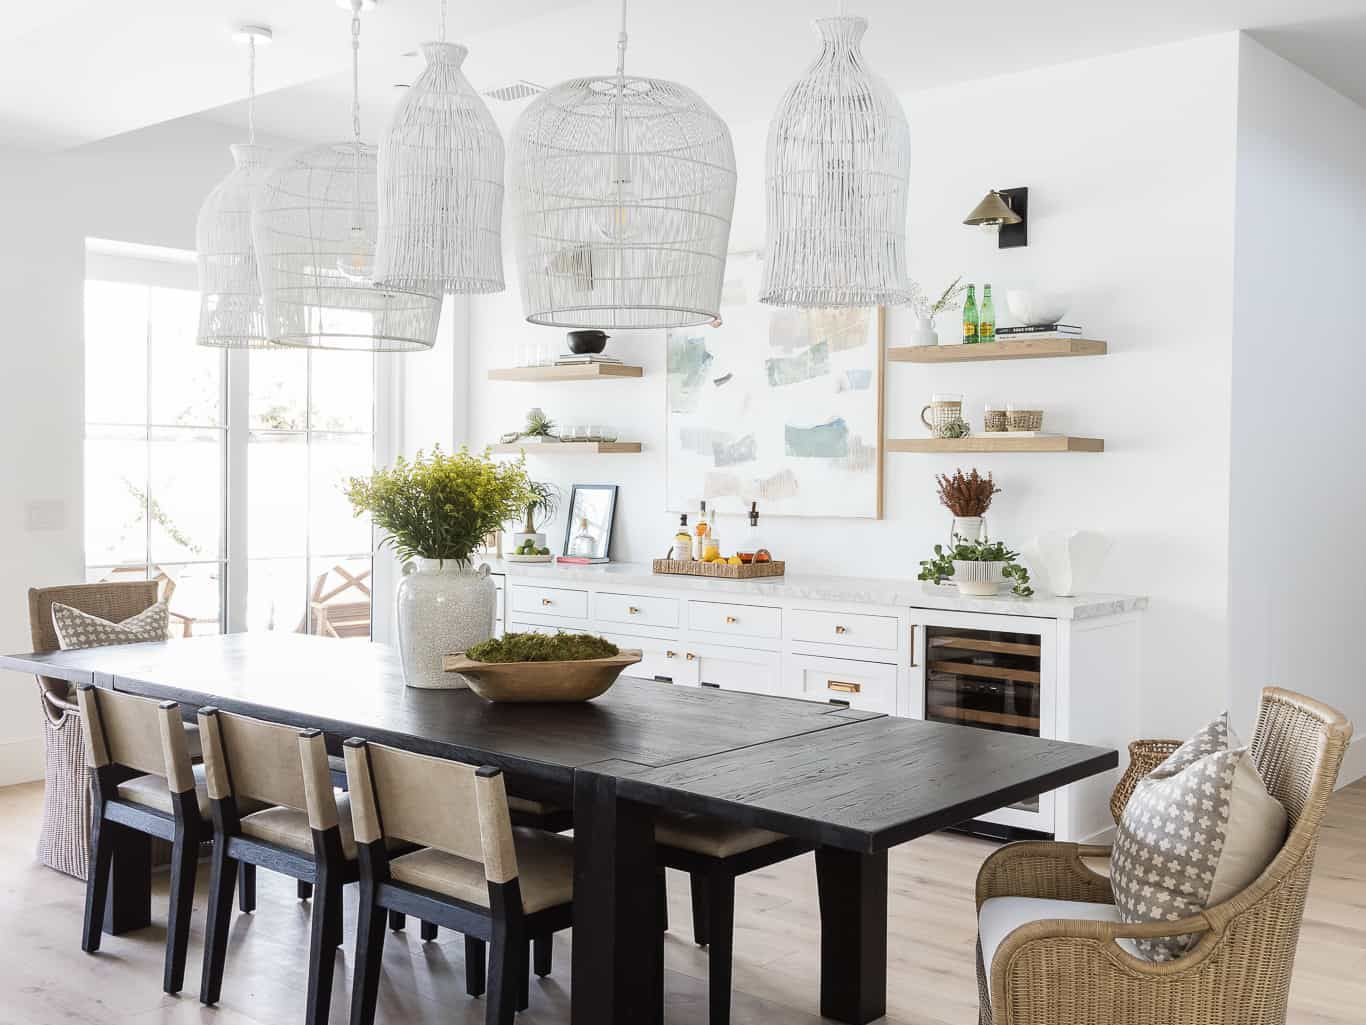 26 Dining Room Light Fixture Ideas You, Rustic Dining Room Lighting